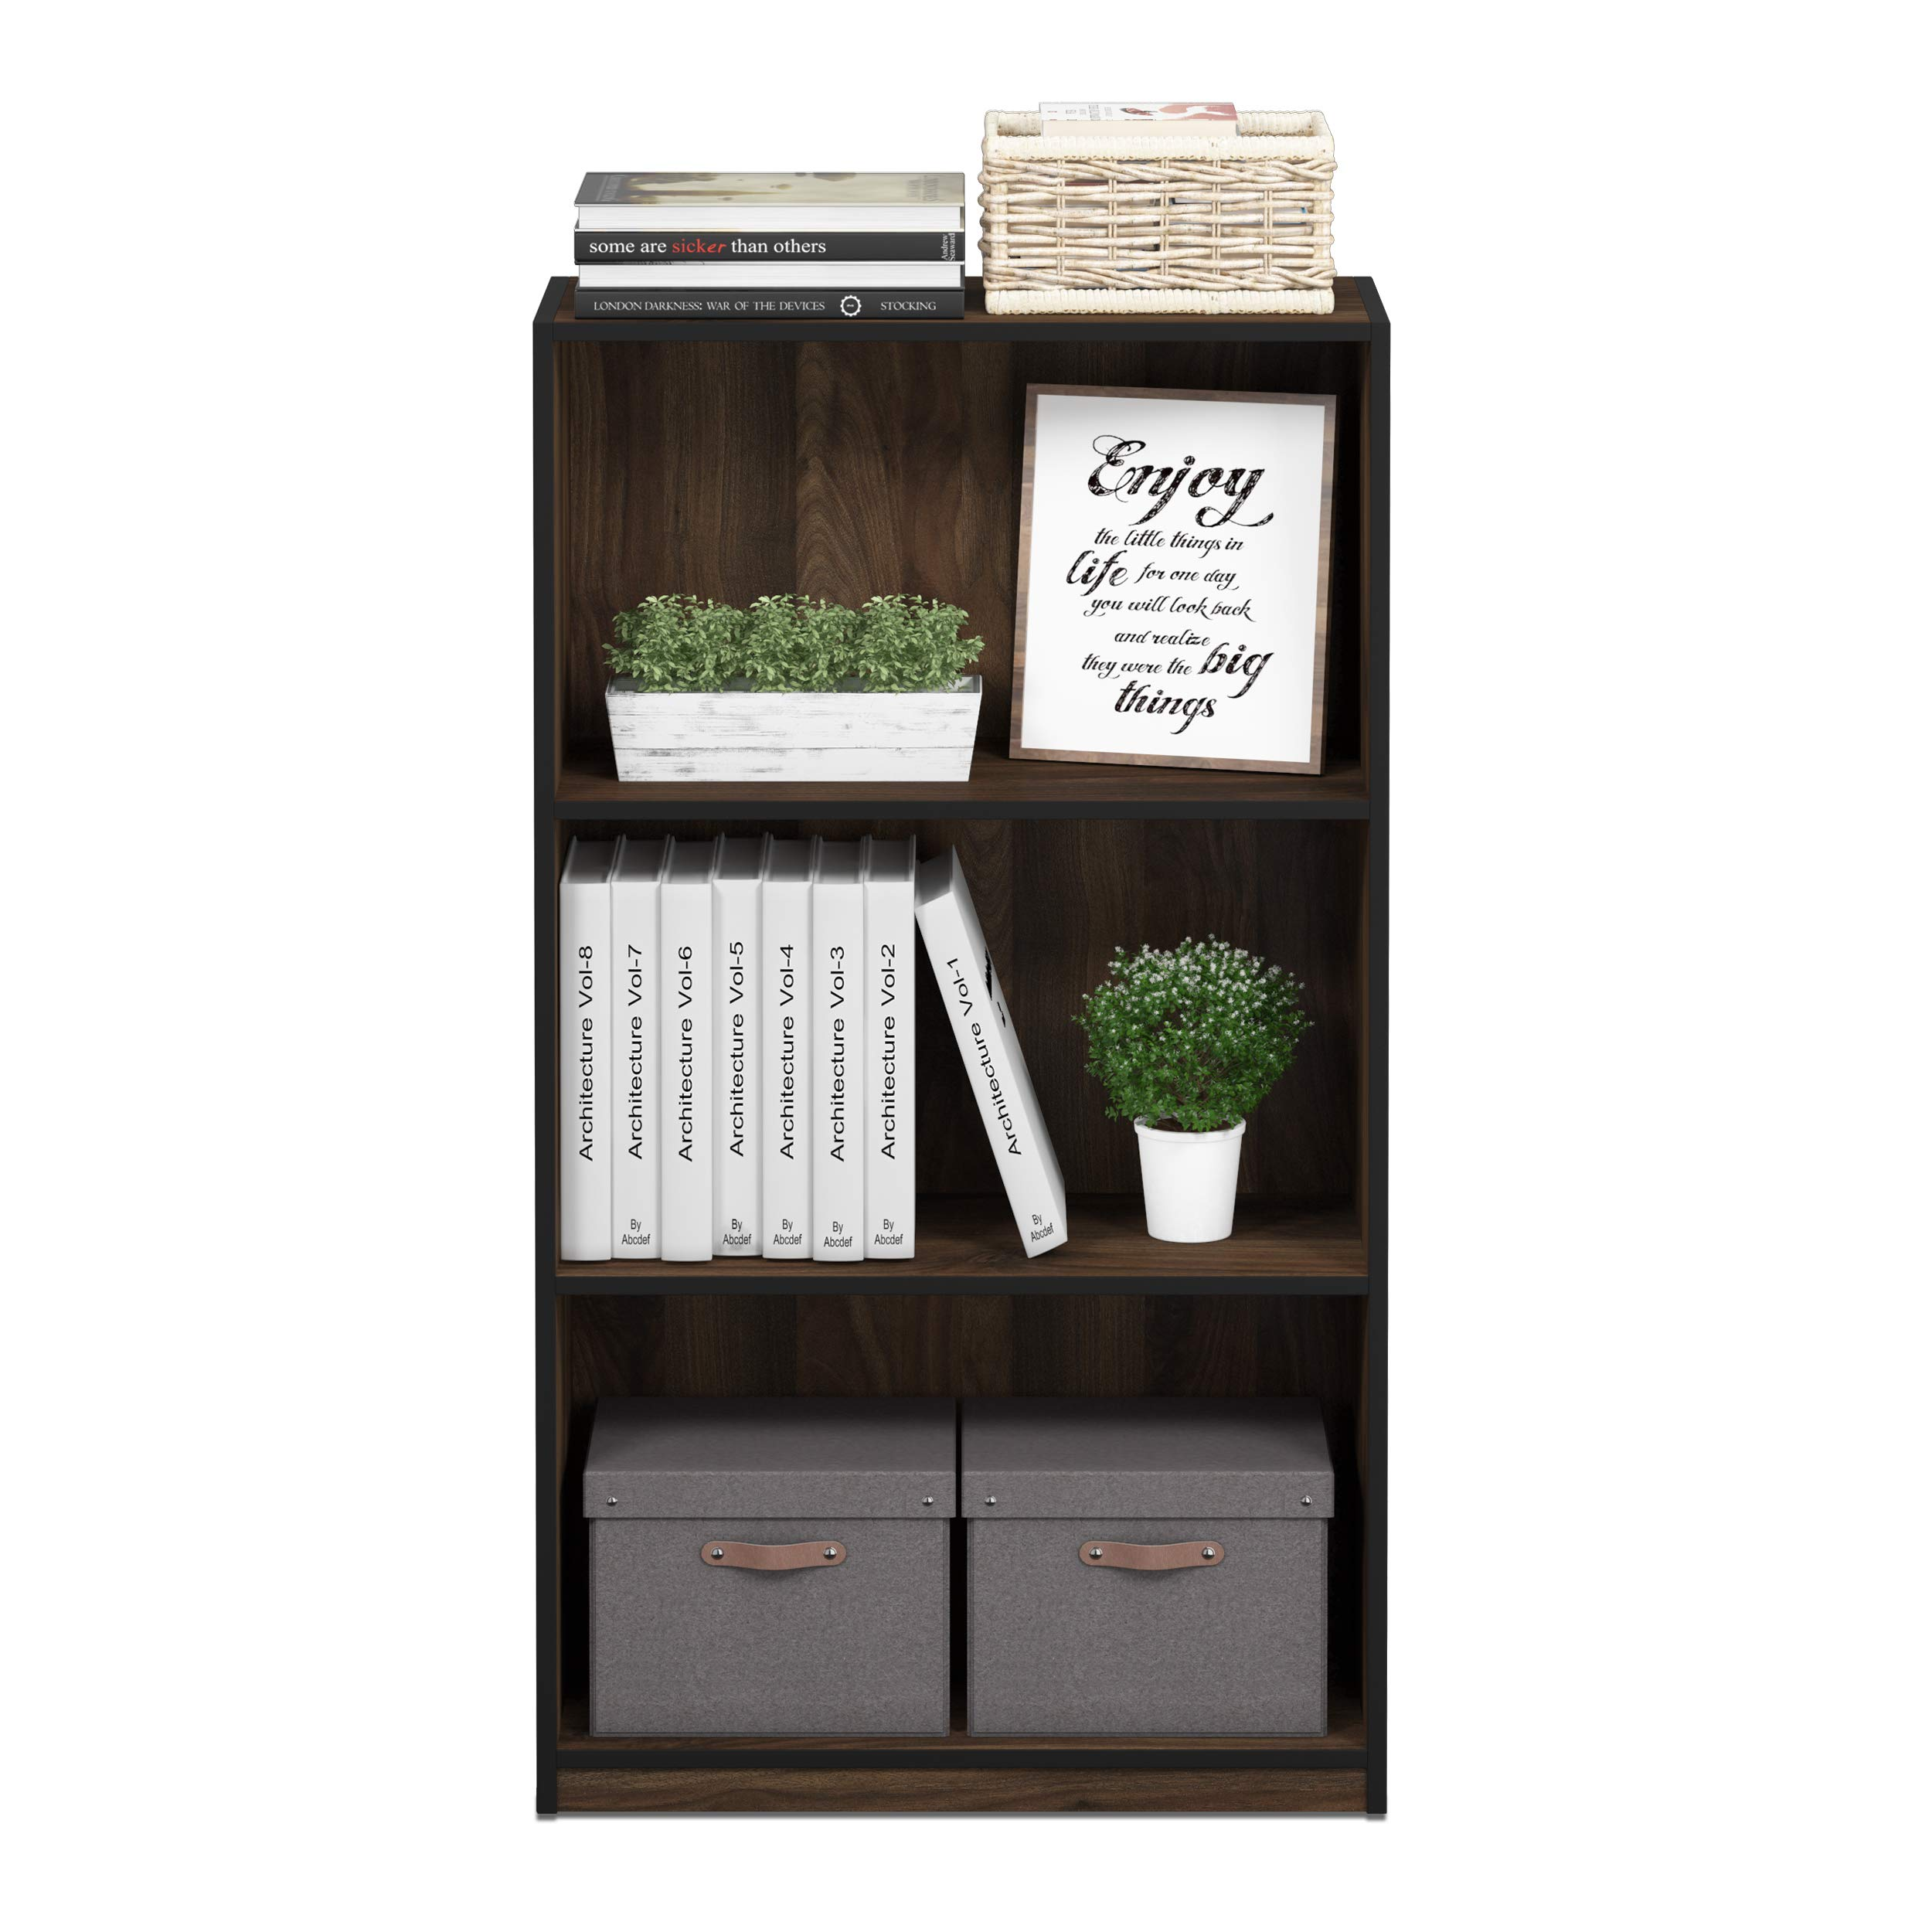 Furinno 99736CWN Basic 3-Tier Bookcase Storage Shelves, Columbia Walnut by Furinno (Image #5)